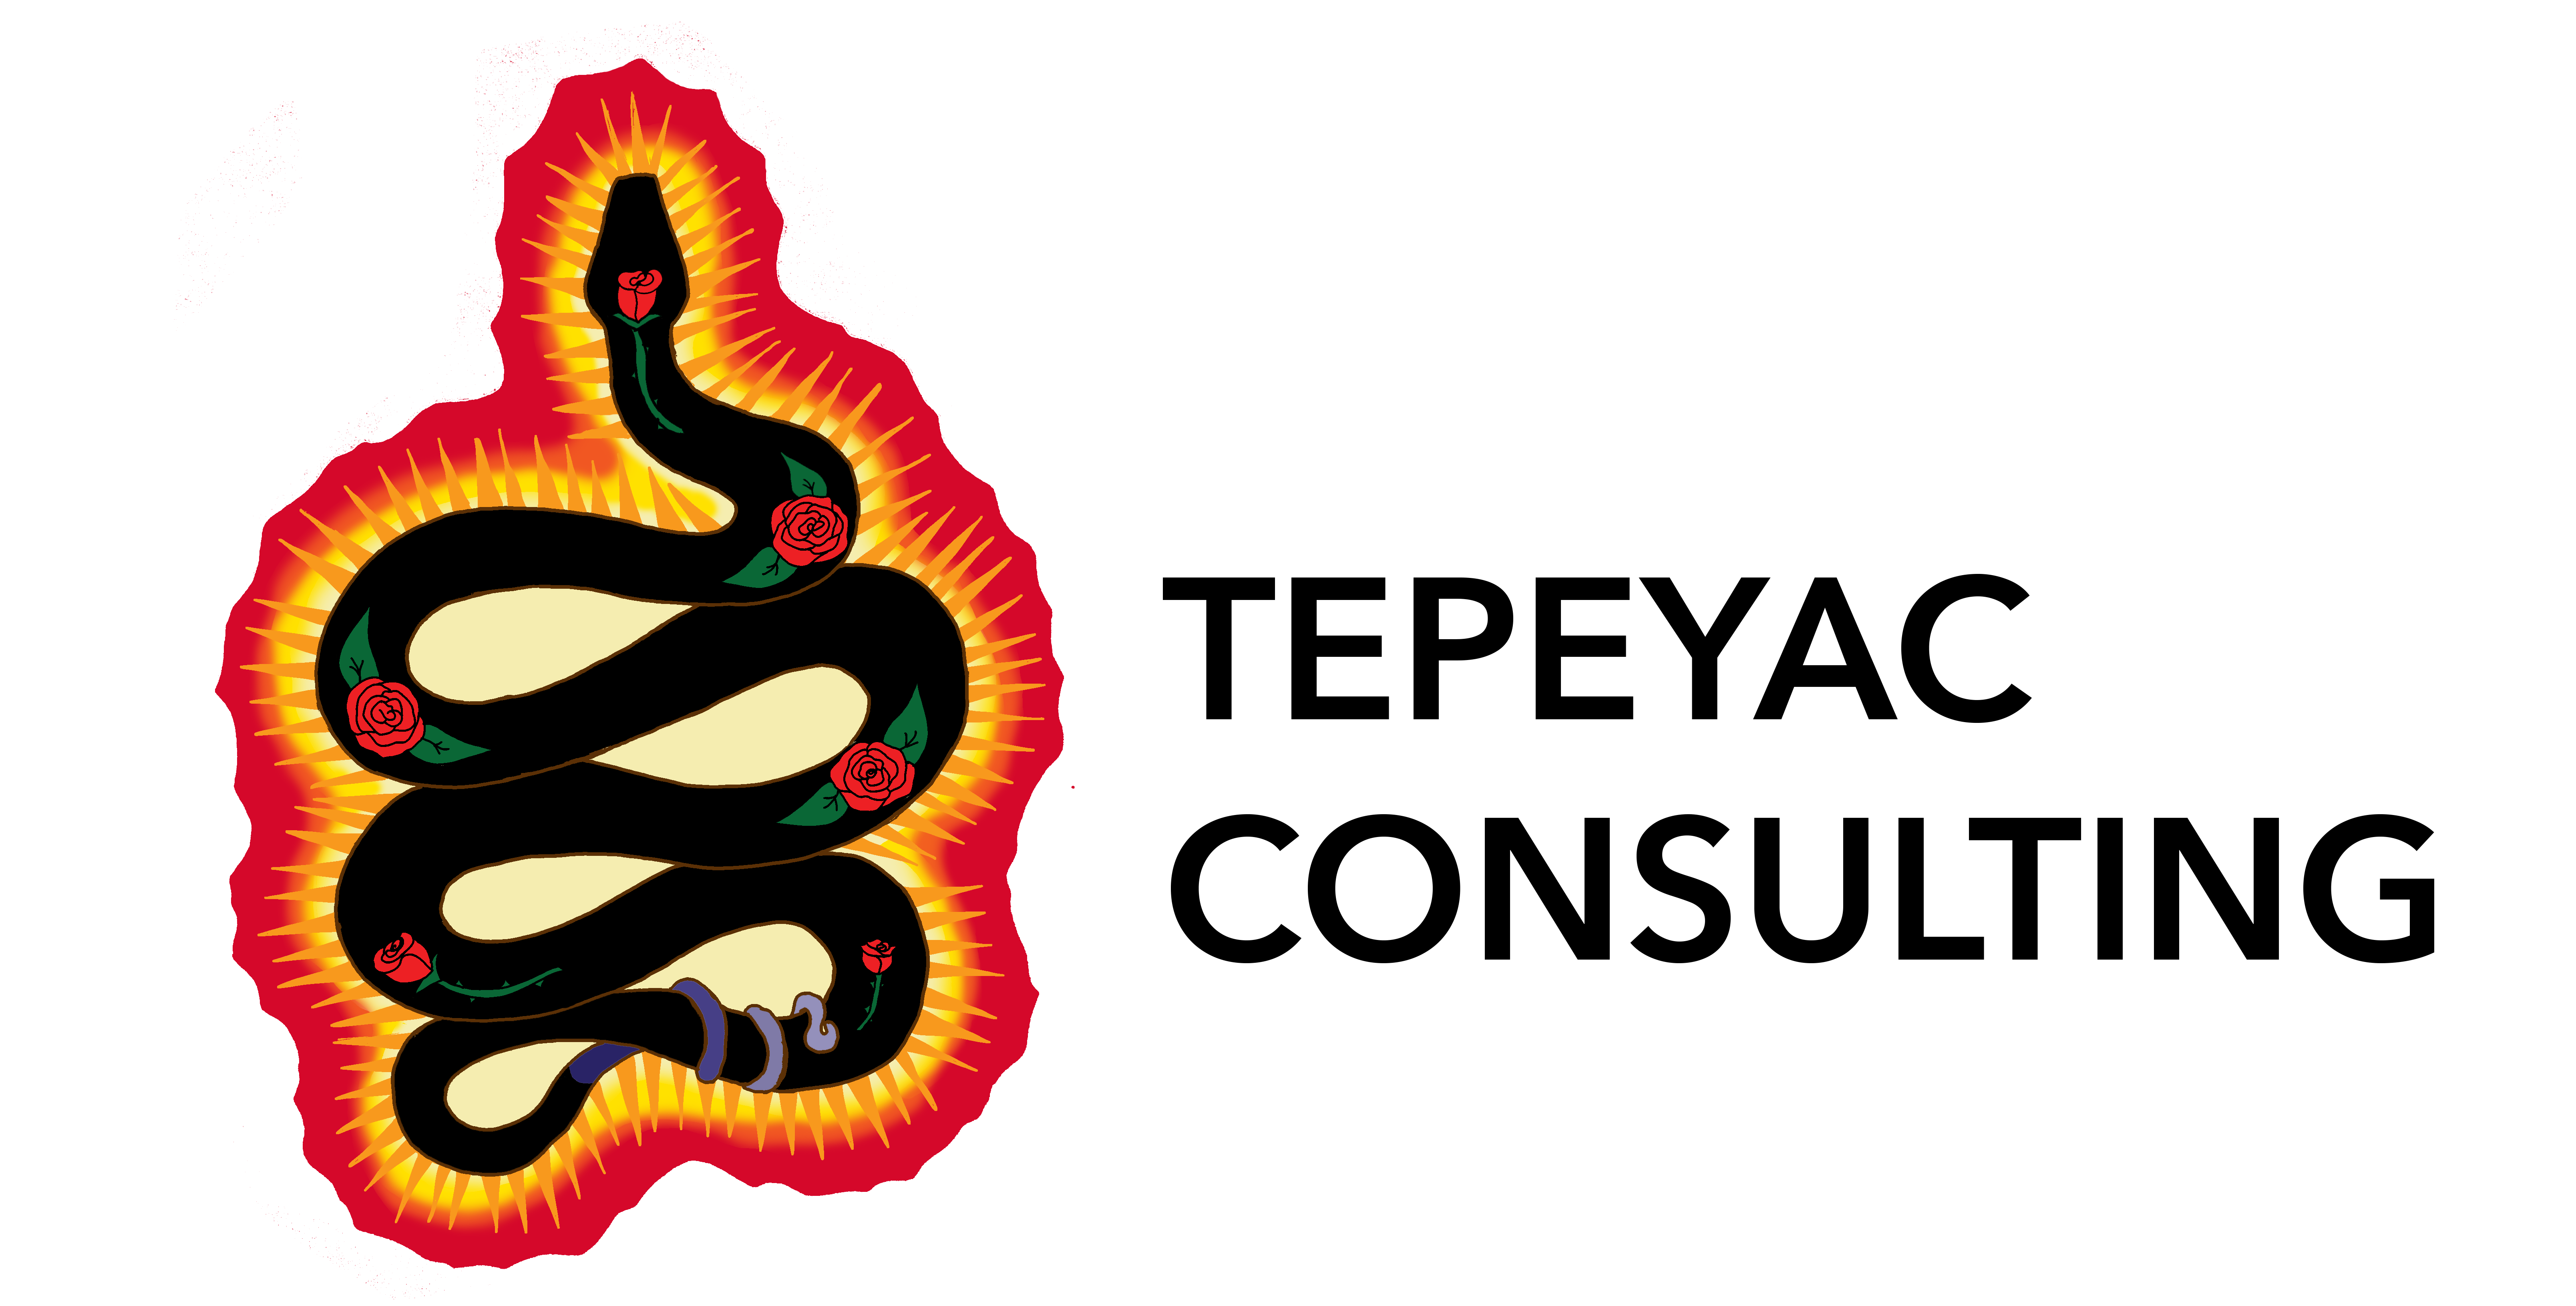 Tepeyac Consulting